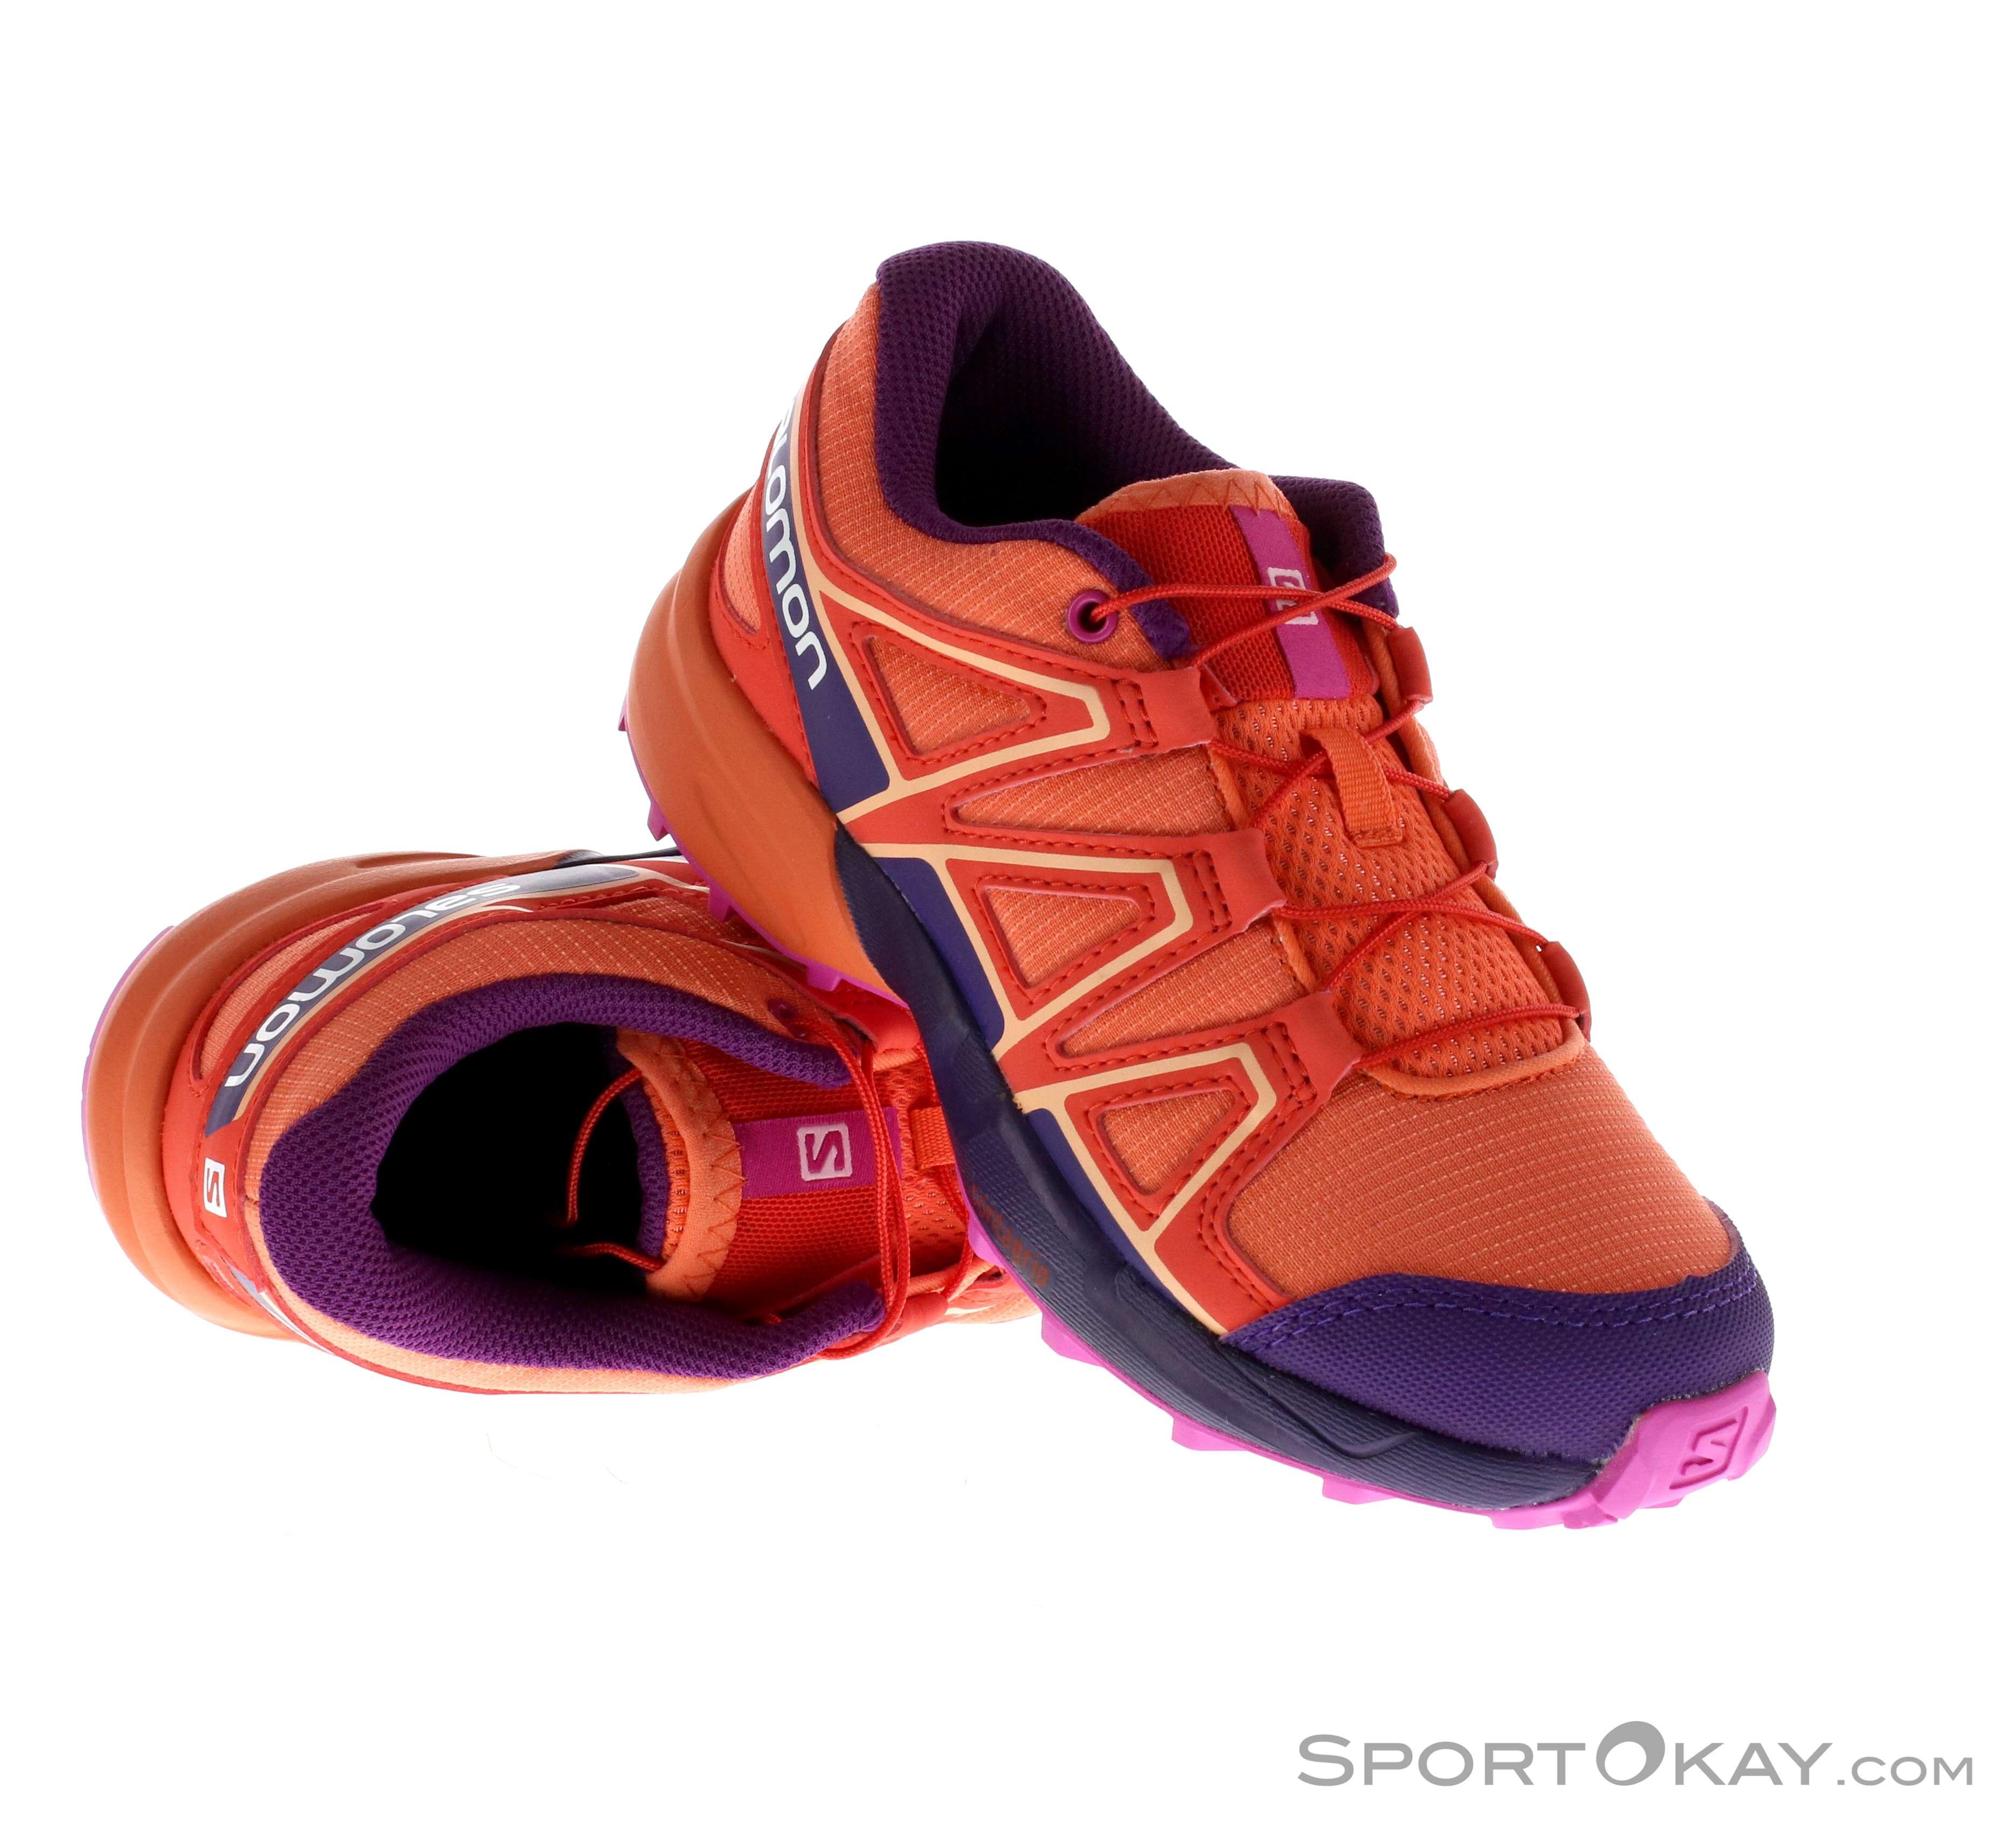 Da Running Trail Speedcross Salomon Bambini Scarpe f6Yb7gyv